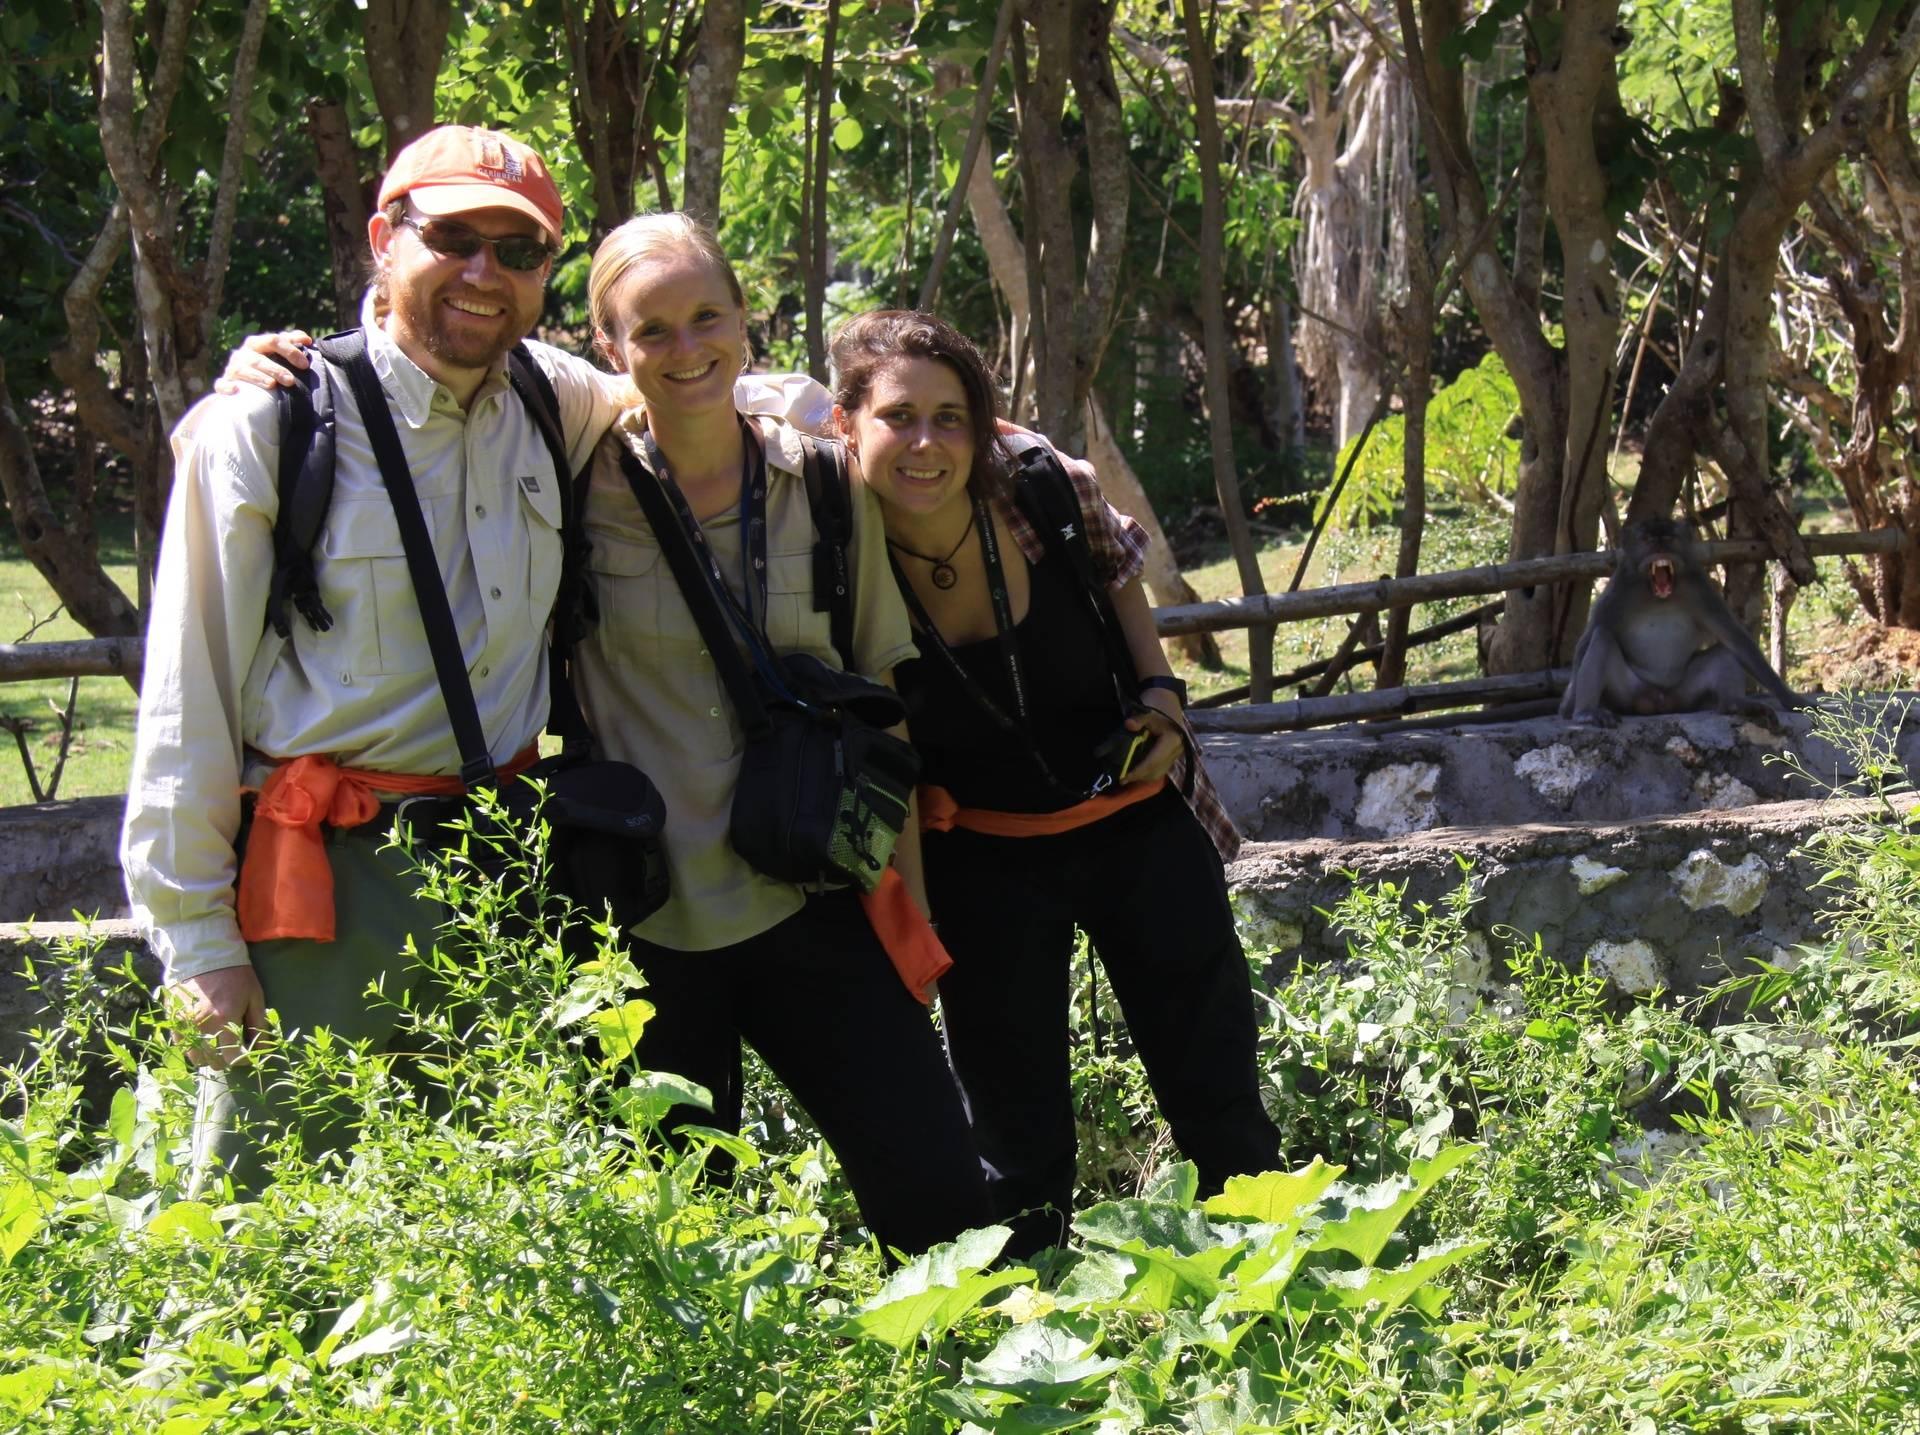 JB Leca, Fany Brotcorne, Lucía Jorge Sales, and a yawning macaque (Uluwatu, Bali, May 2016)